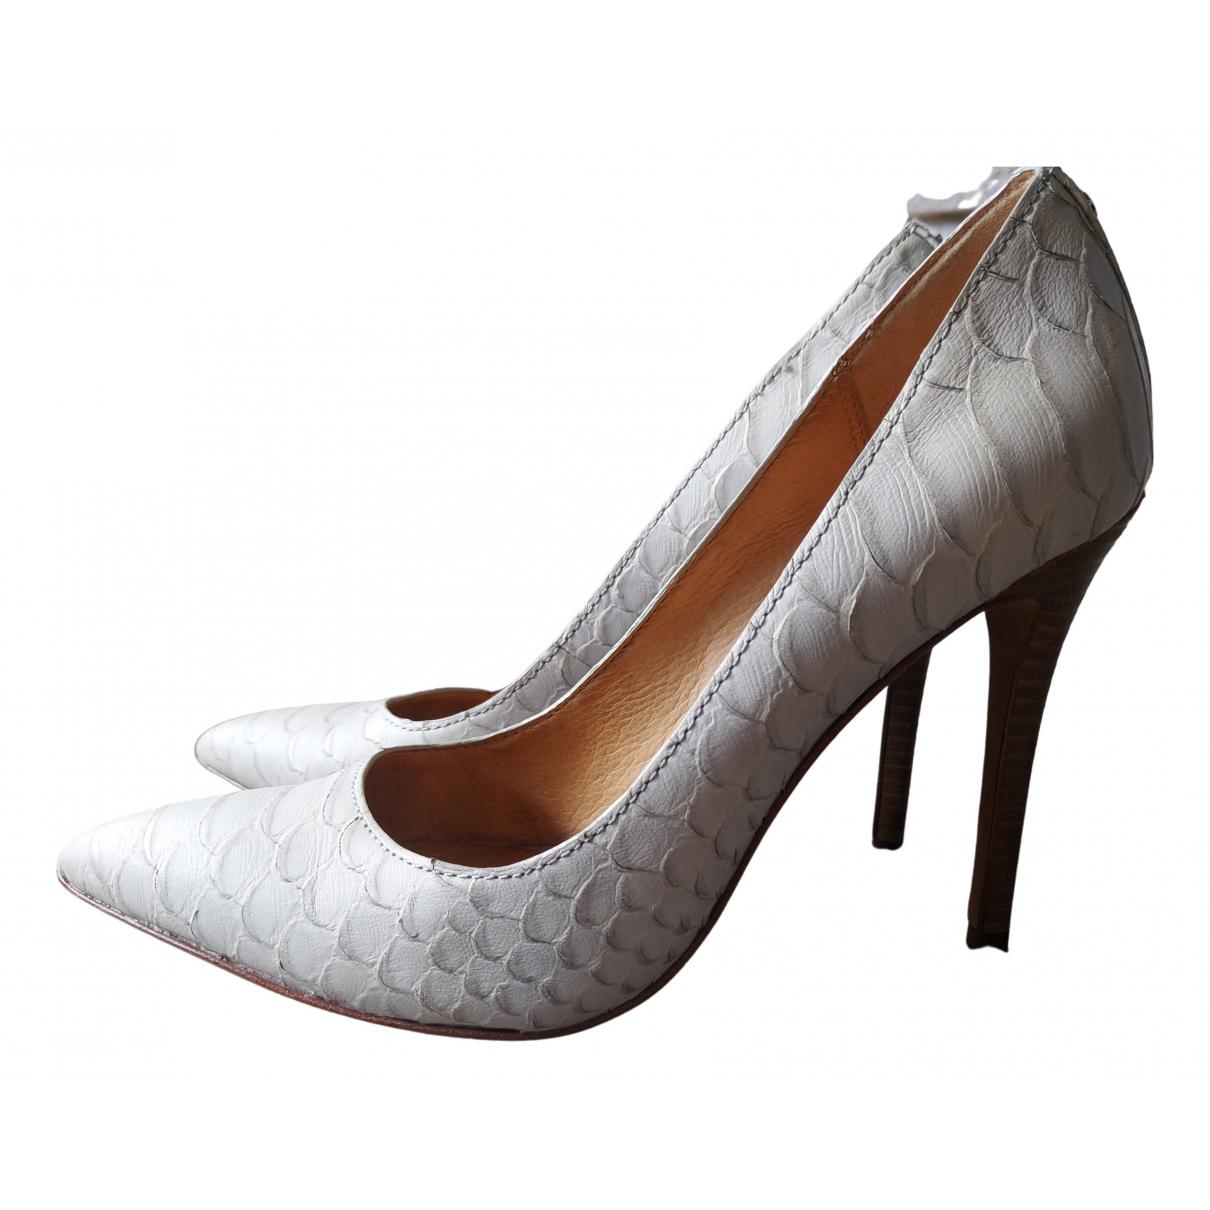 Coach N White Leather Heels for Women 37.5 EU